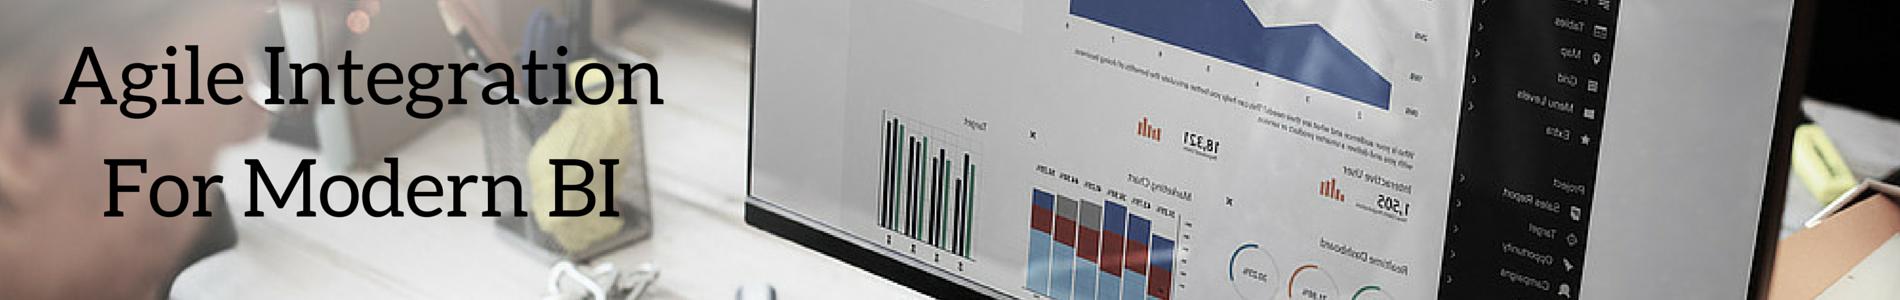 agile integration for modern business intelligence